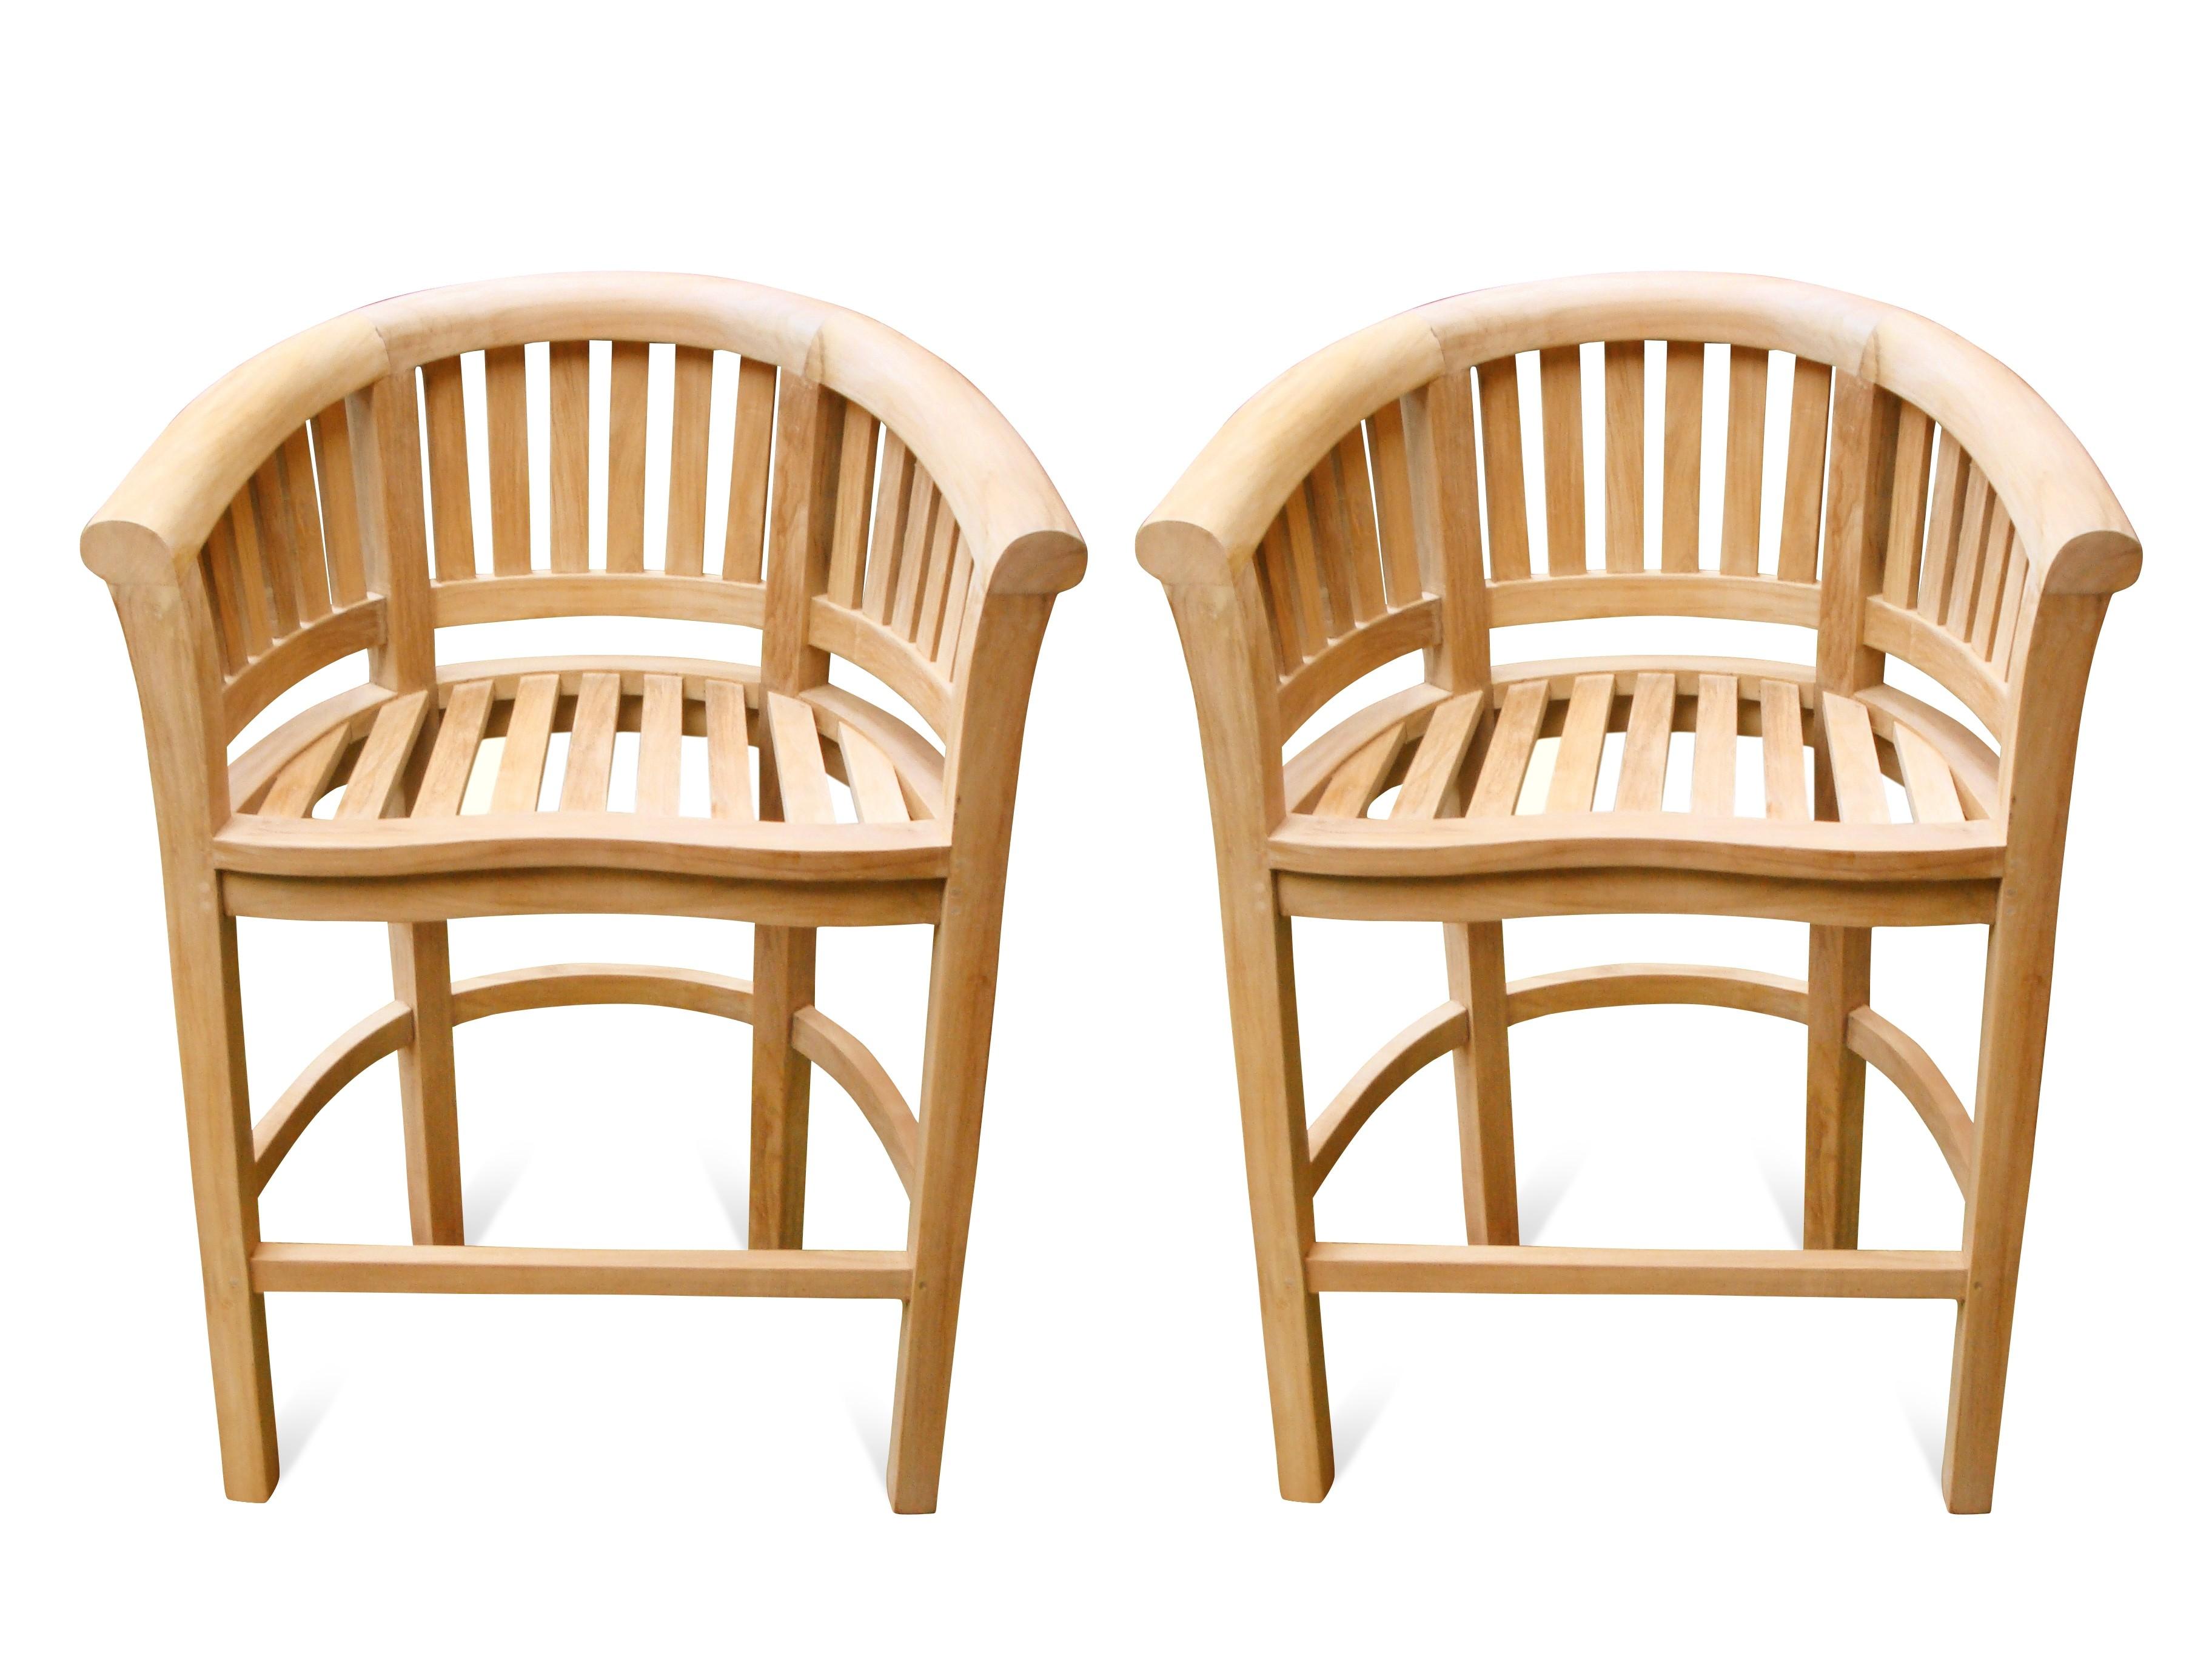 Kensington Curved Teak Arm Bar chair. 2 Pack